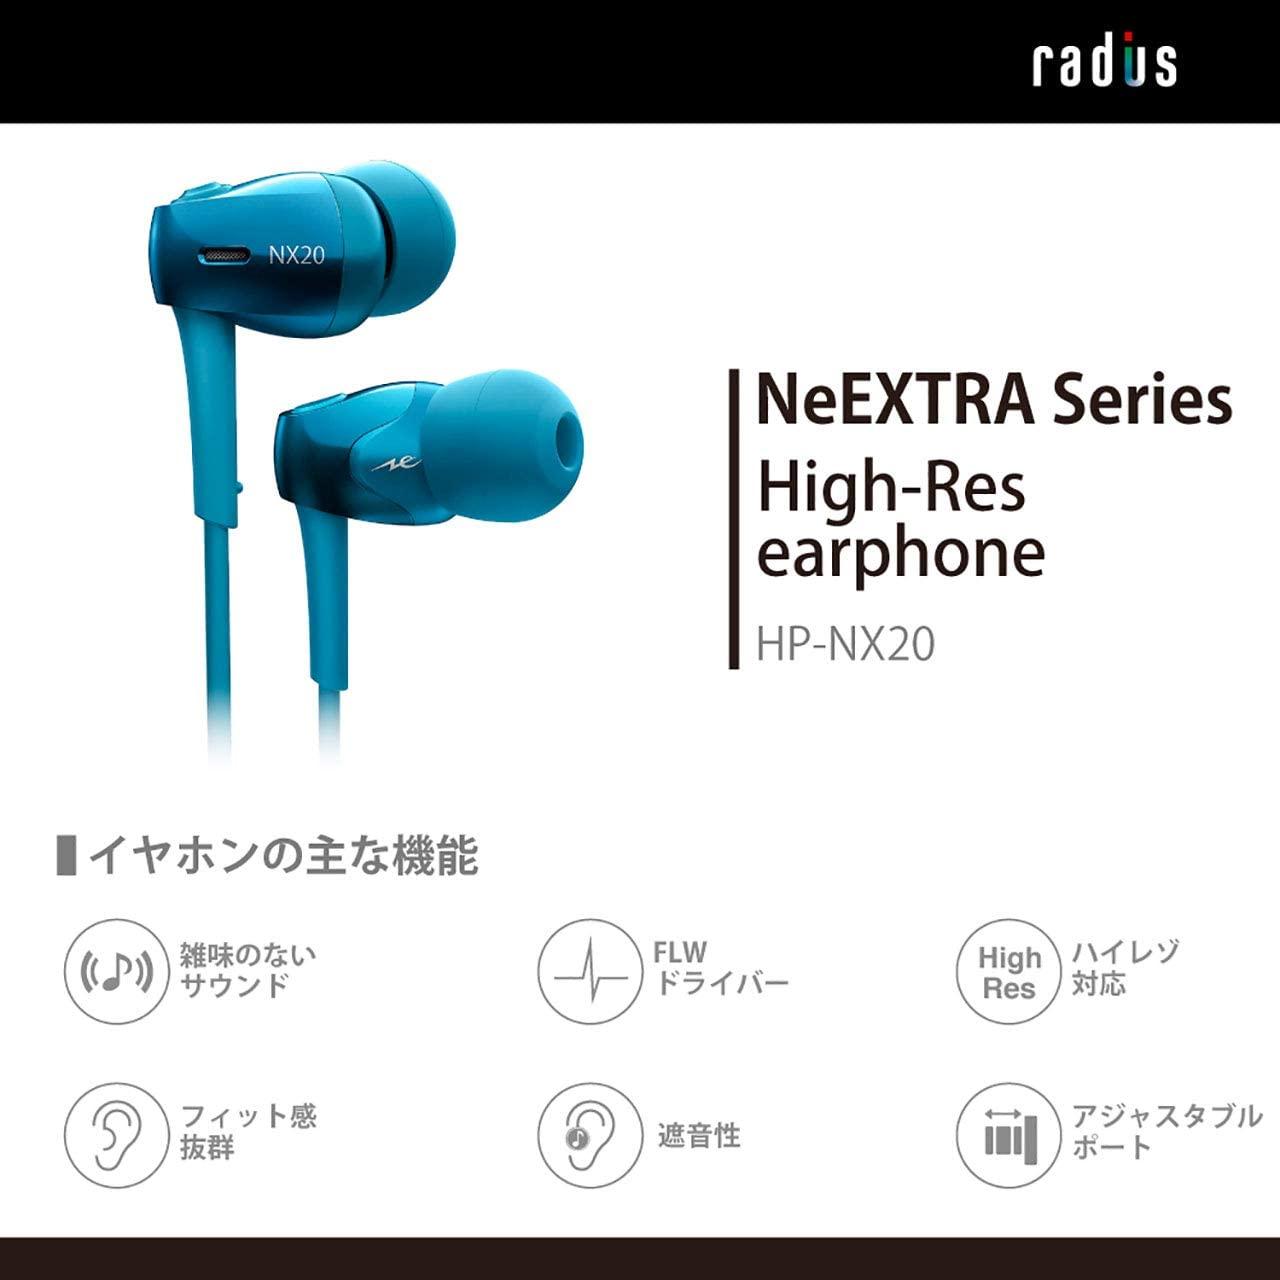 HP-NX20 NeEXTRAシリーズ ハイレゾイヤホン